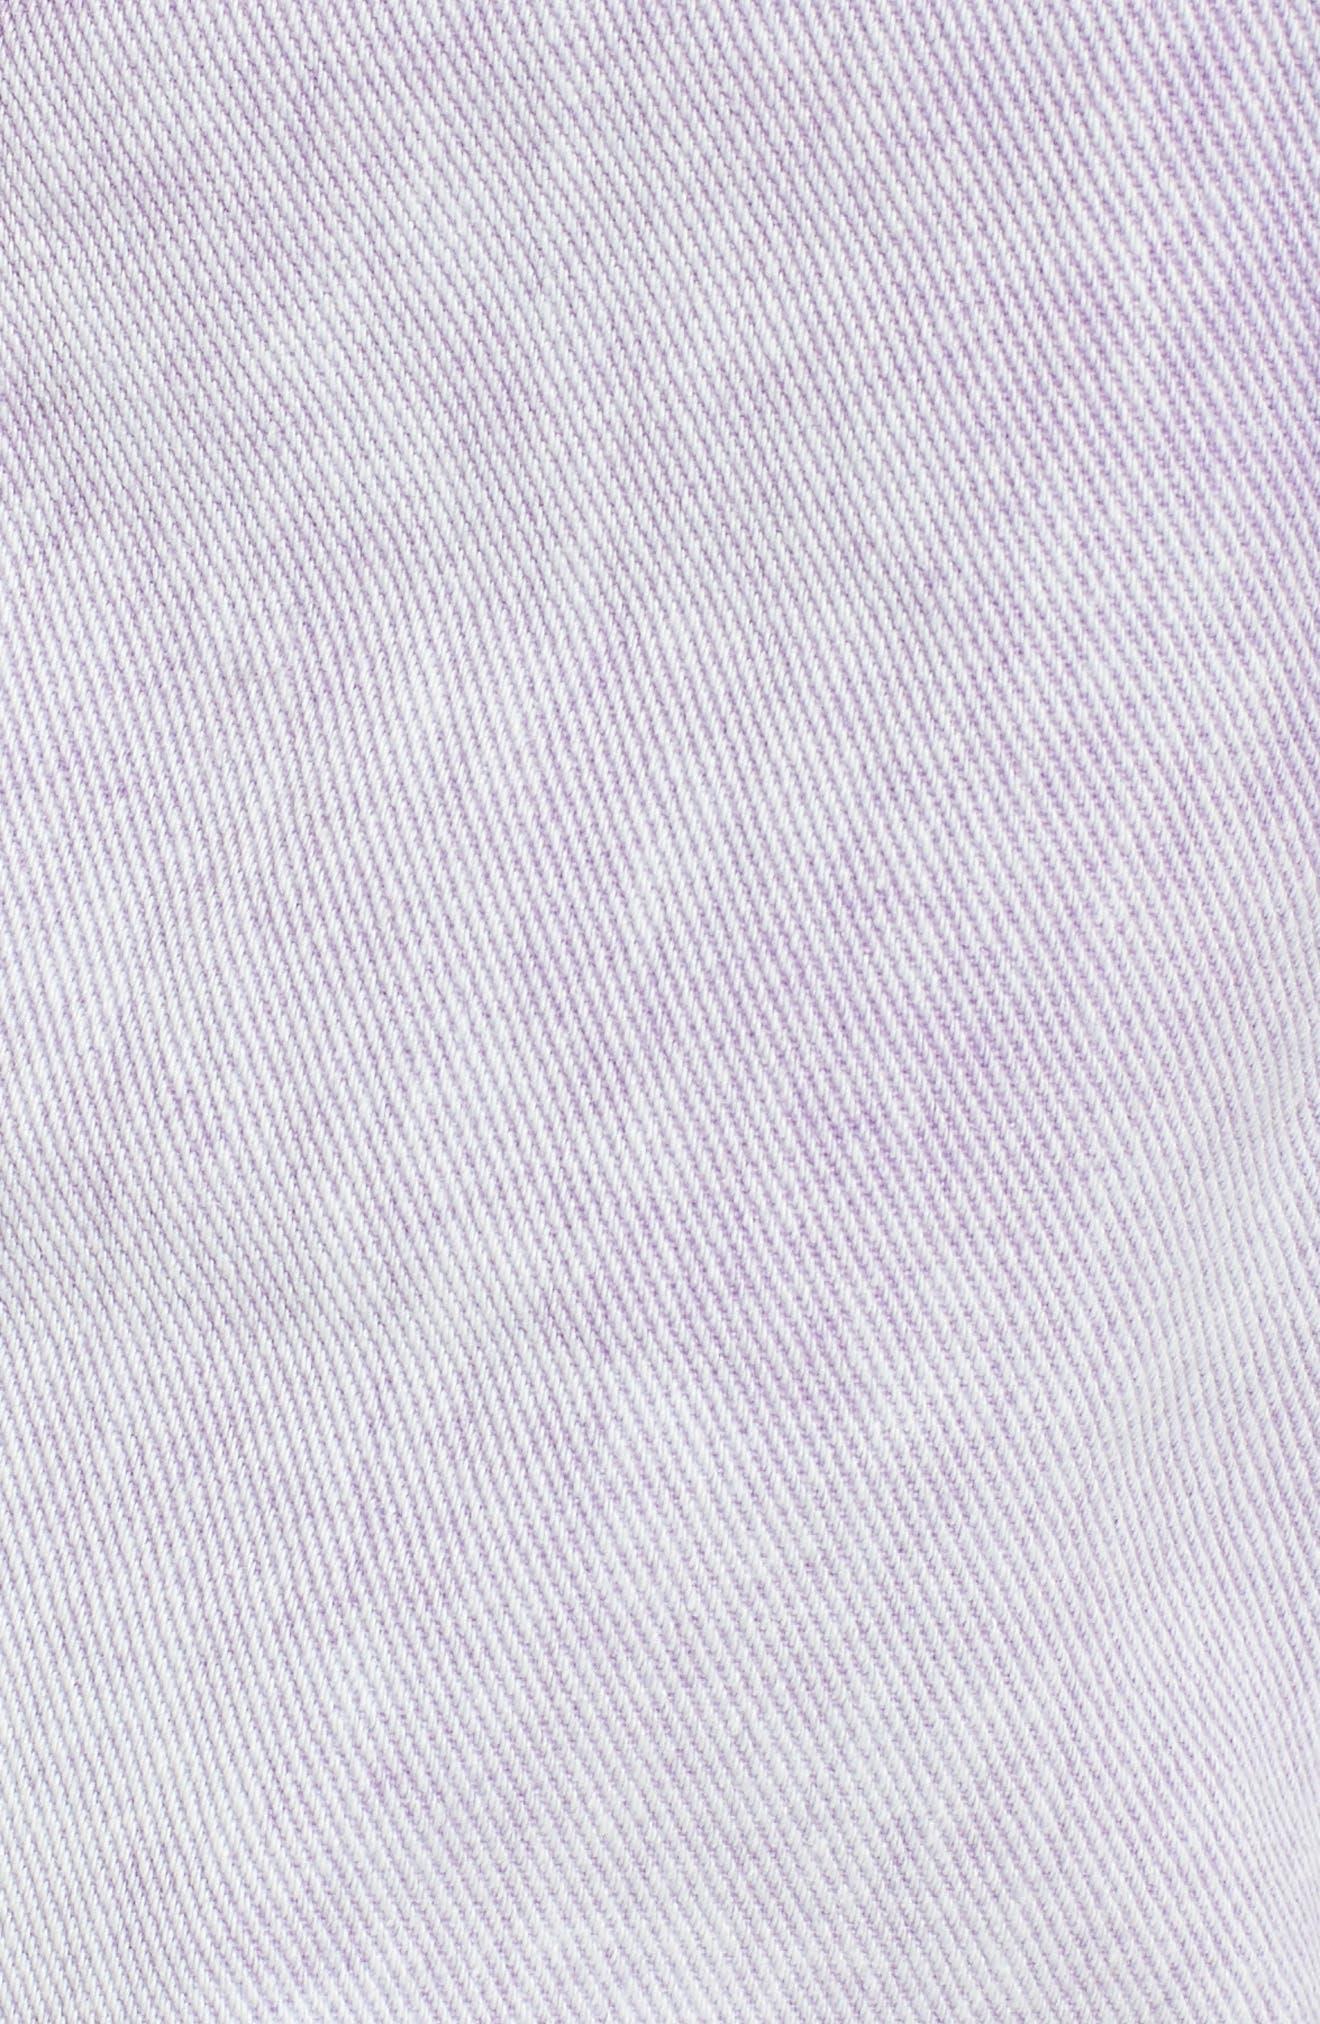 Unionbay Devo Acid Wash Denim Shorts,                             Alternate thumbnail 5, color,